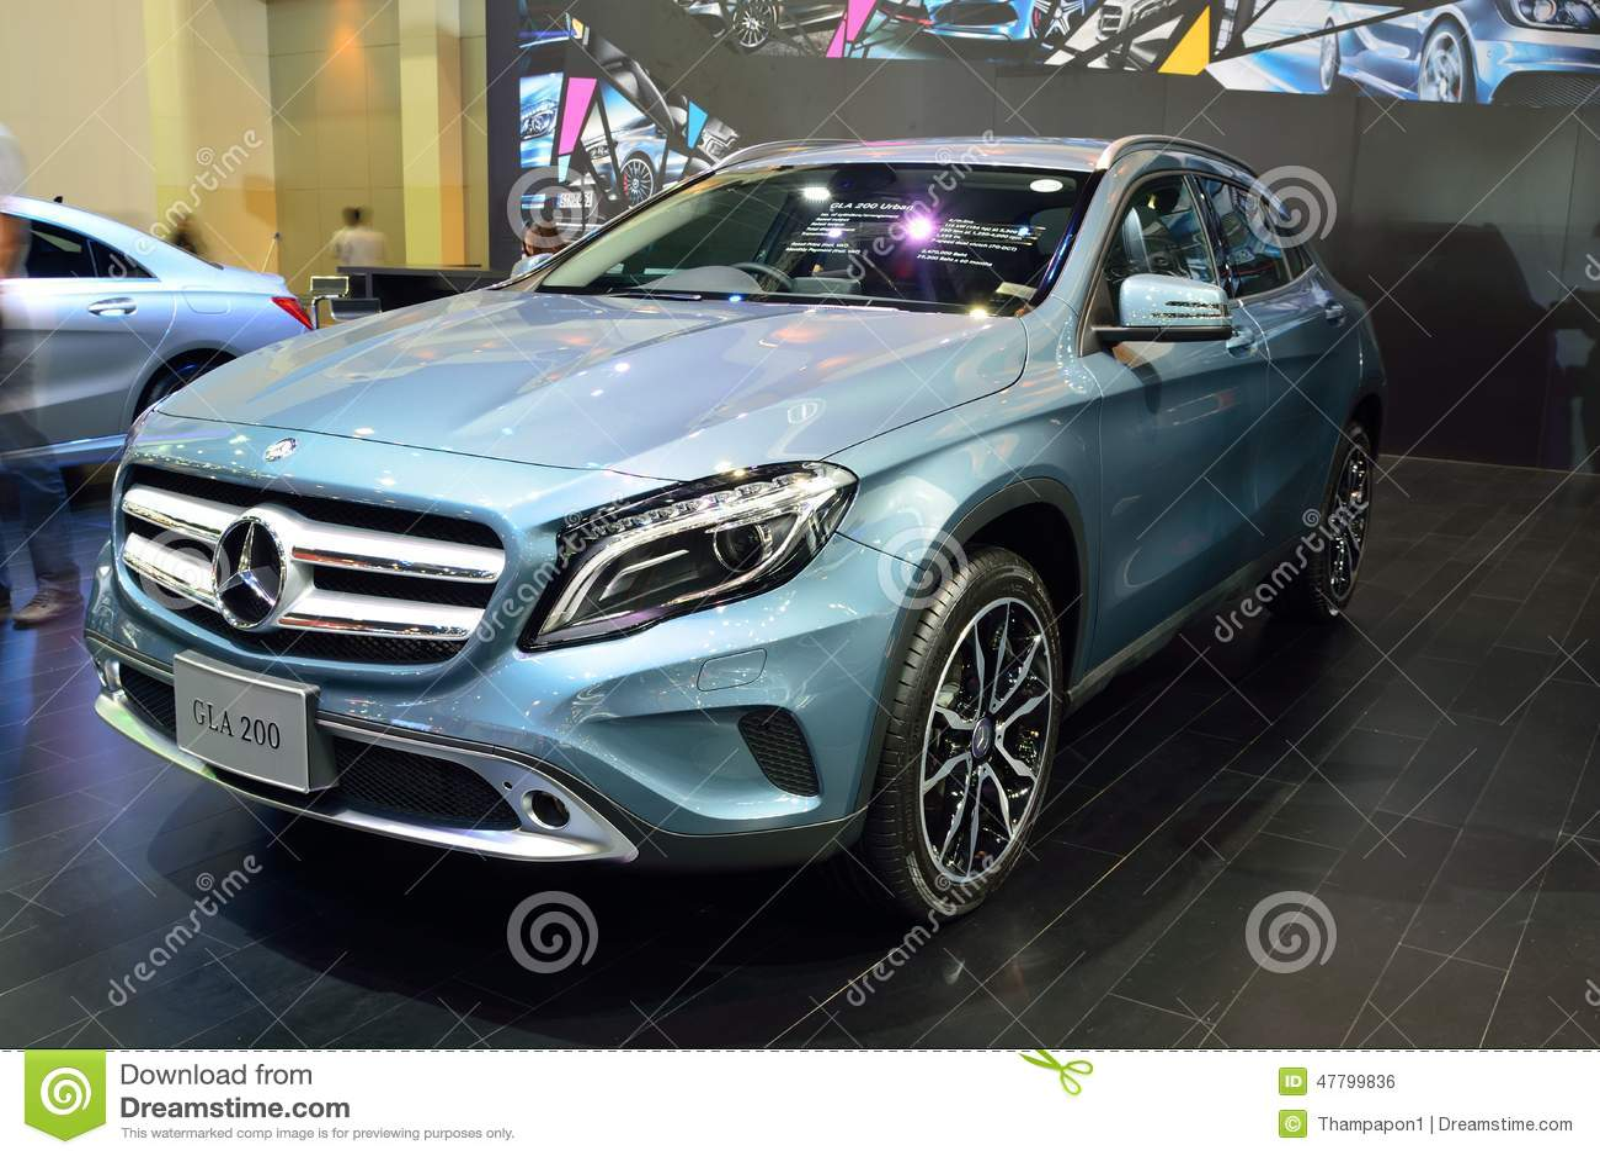 Nonthaburi december 1 mercedes benz gla 200 car display for Mercedes benz gla 200